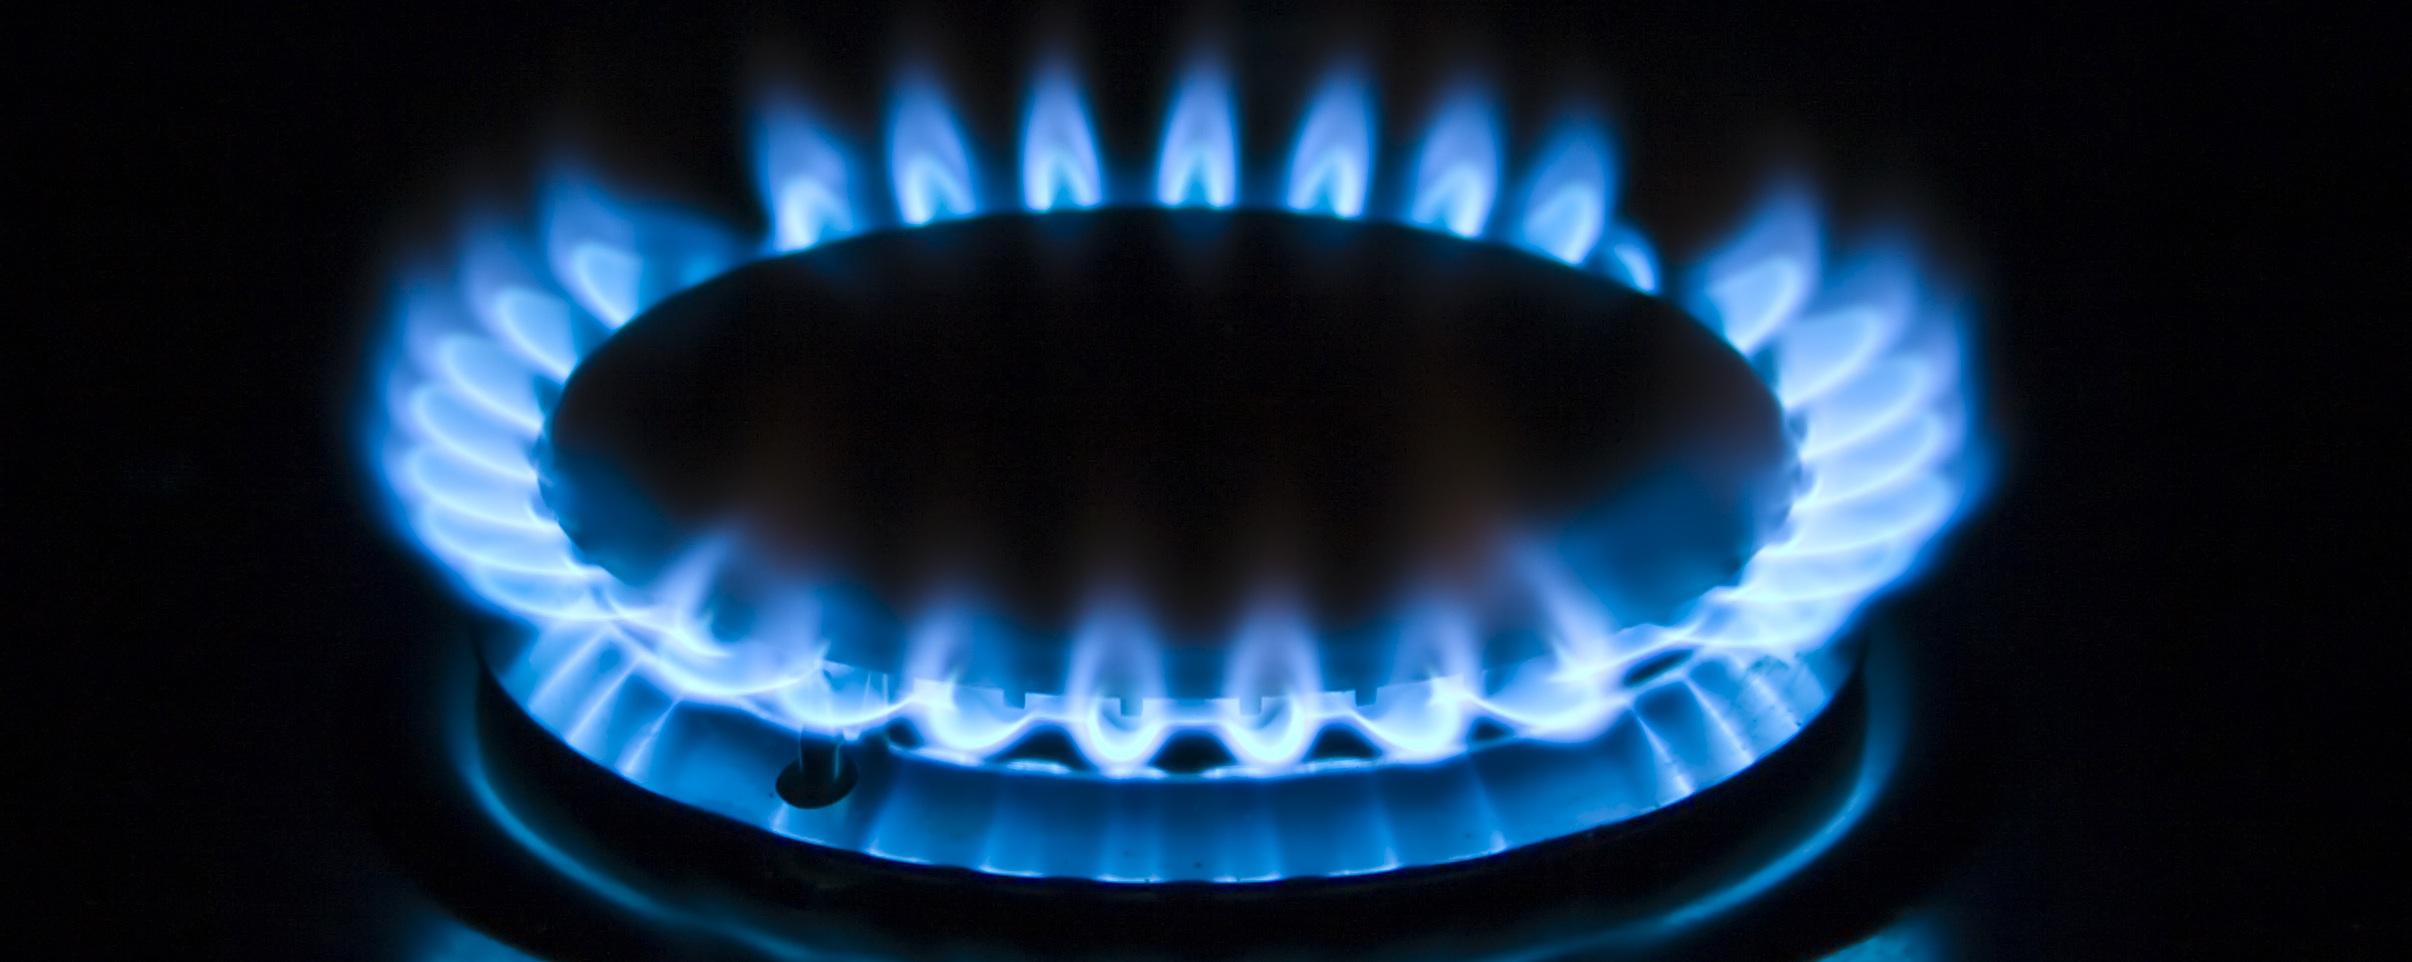 Natural Gas Wave Analysis – 27 September, 2019